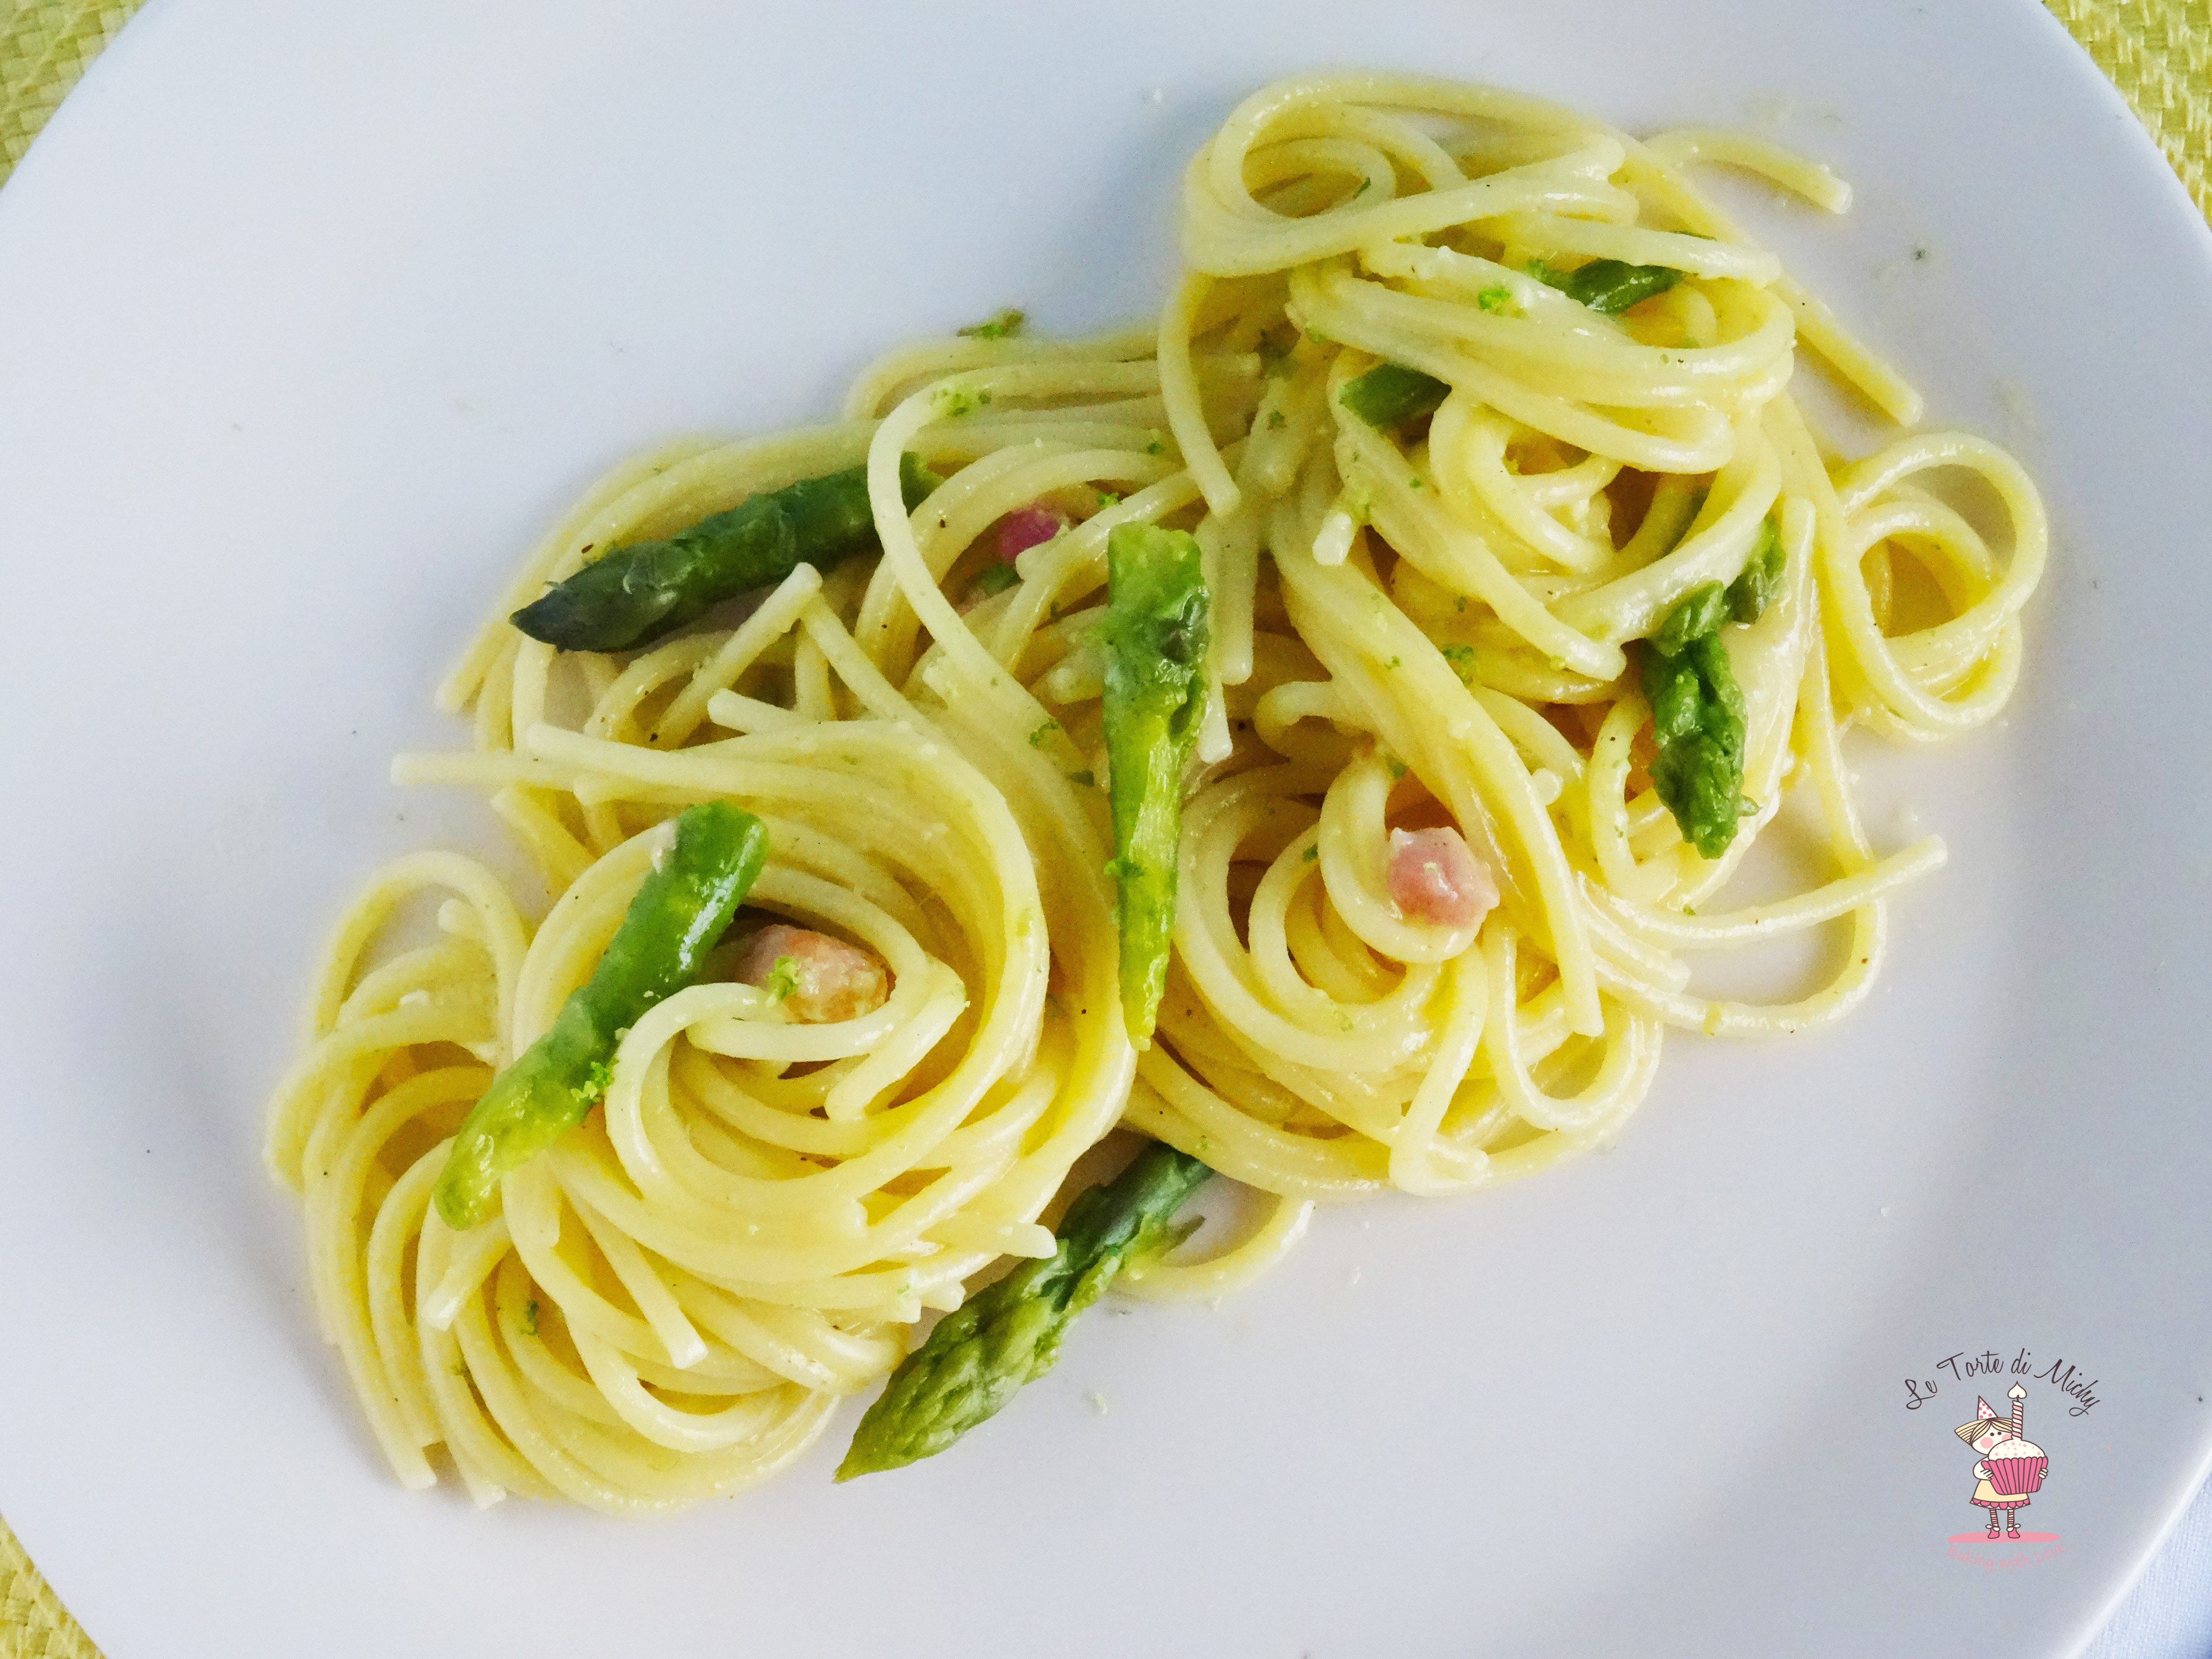 Spaghetti alla carbonara con asparagi di Heinz Beck